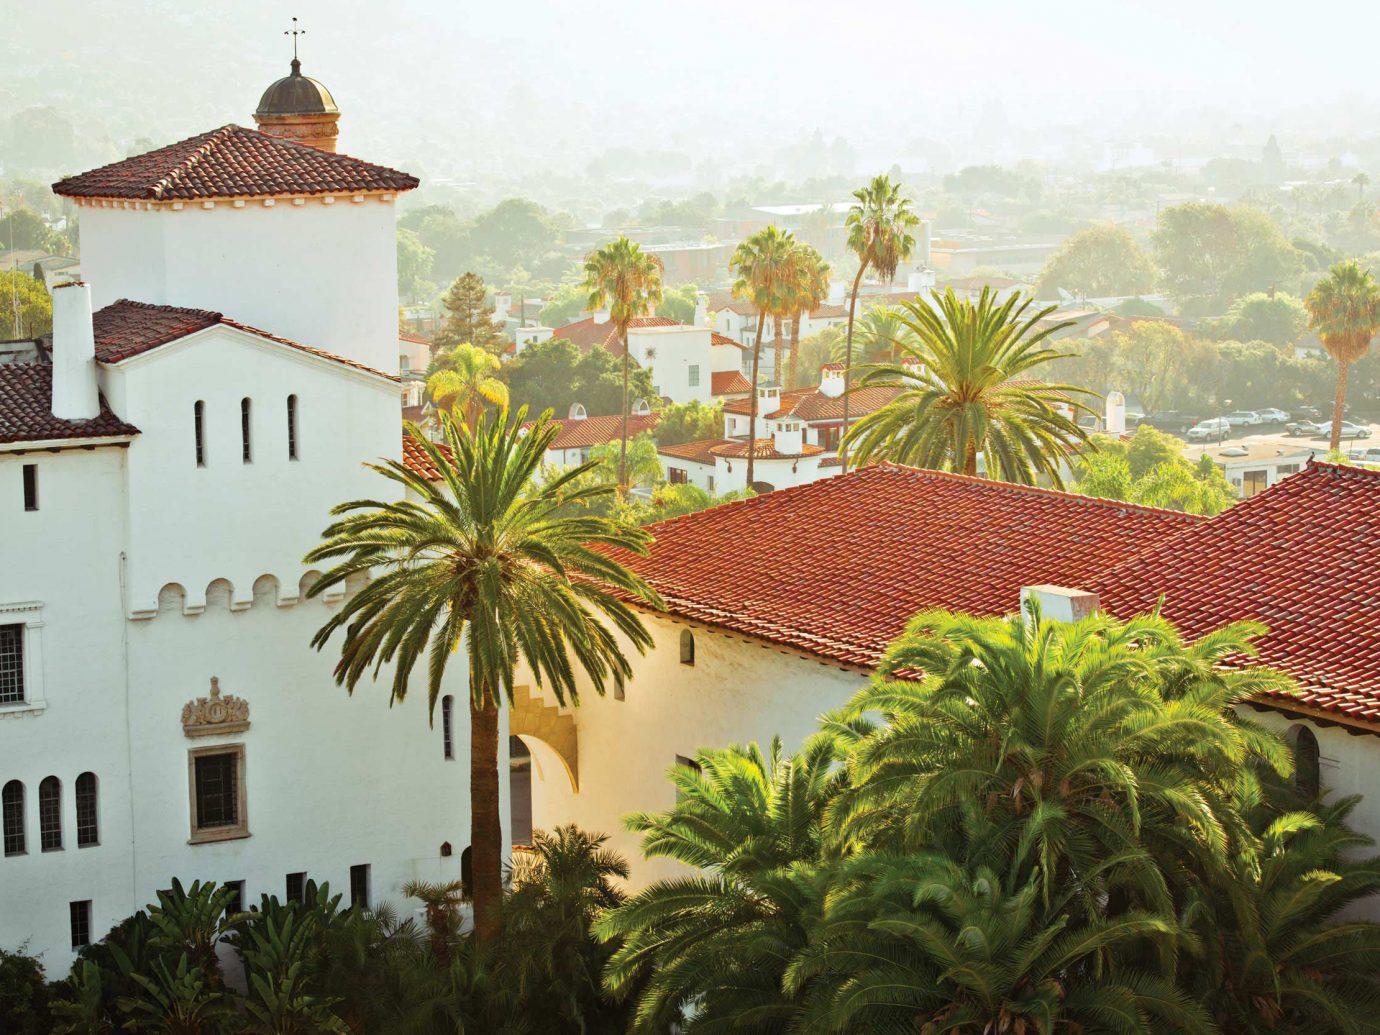 Santa Barbara spanish terra cotta roofs